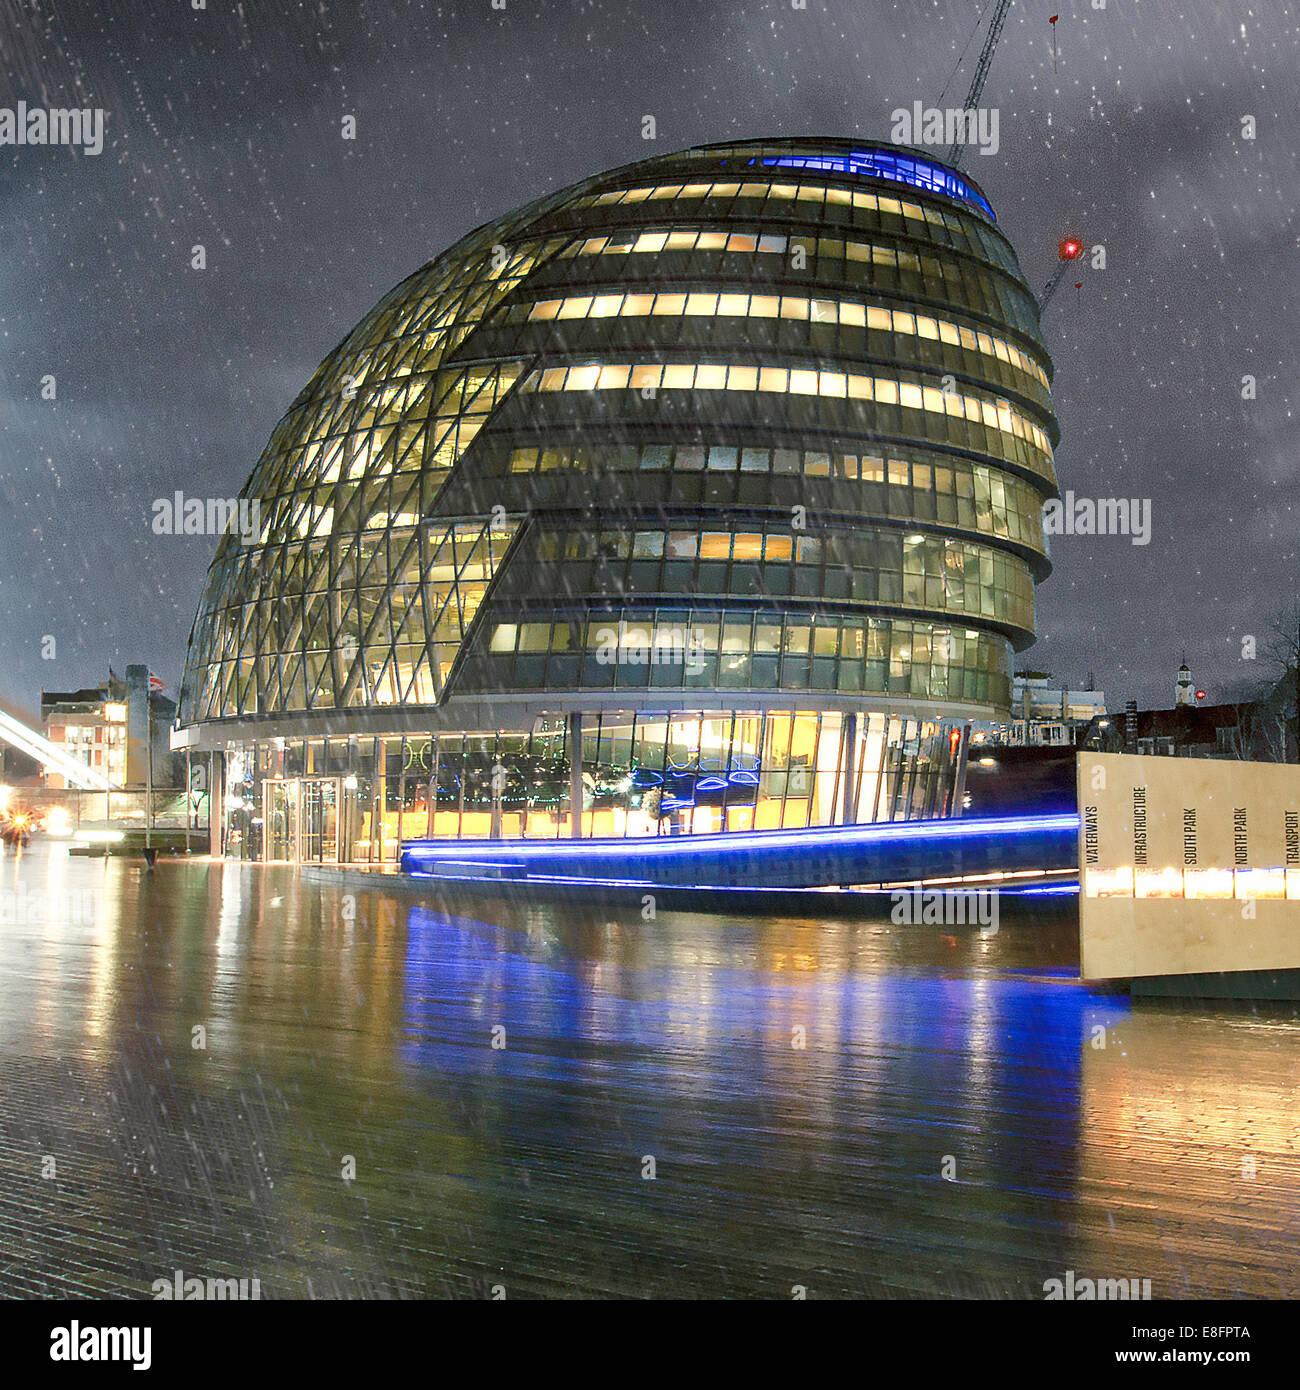 Rathaus in Regen, London, England, Großbritannien Stockbild